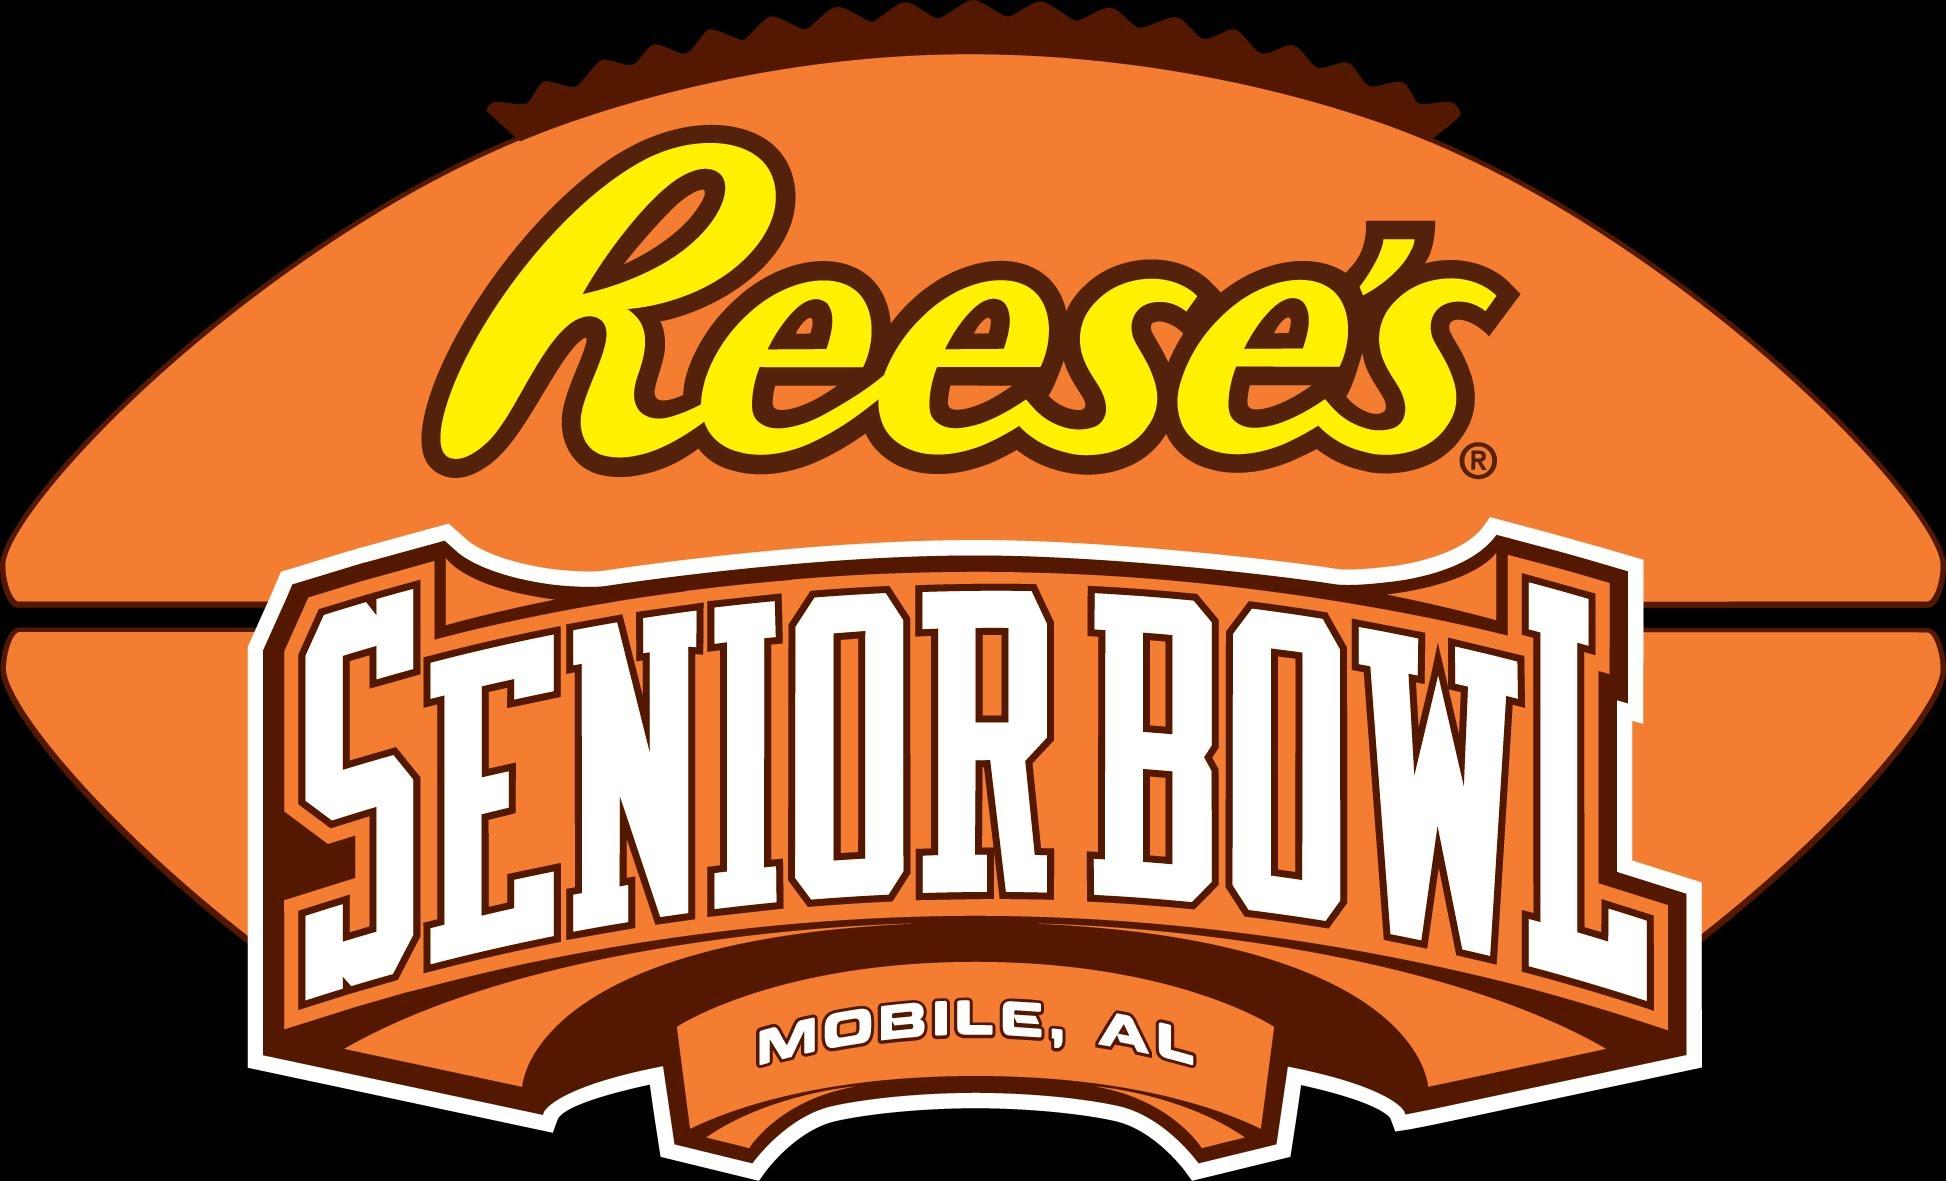 Dawkins, Reddick Shine at New Positions in Senior Bowl